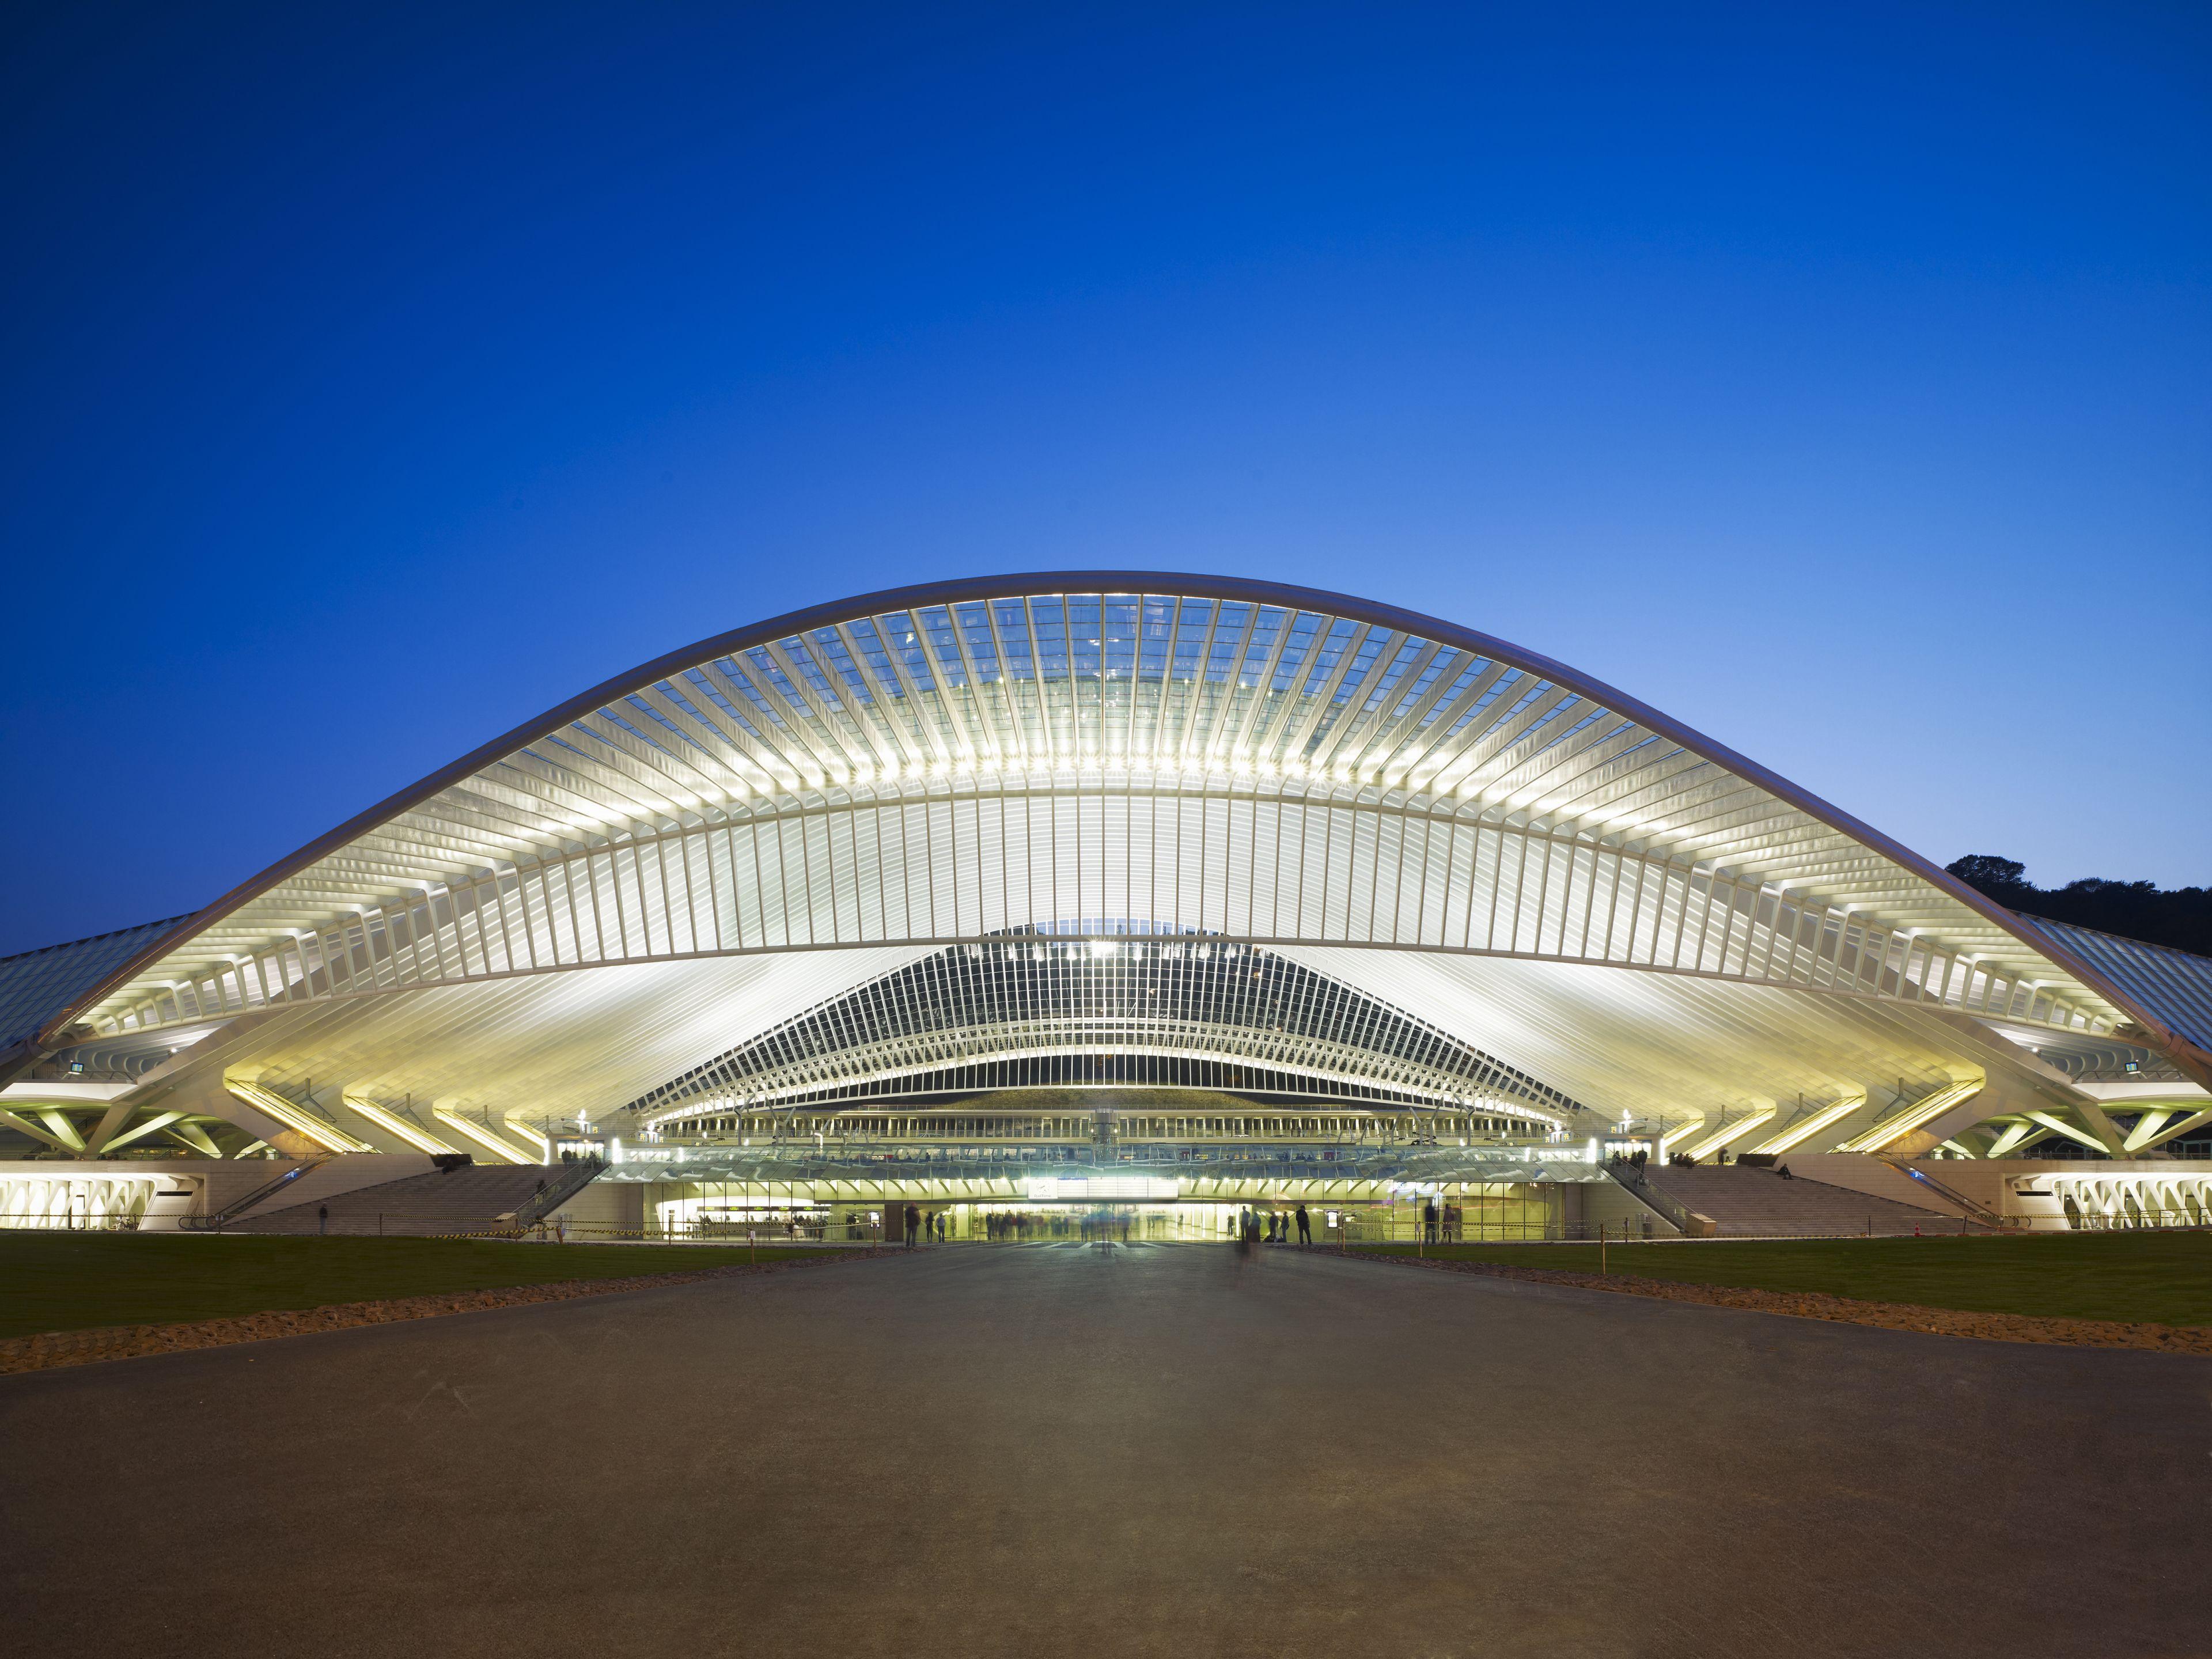 ایستگاه راهآهن لیژ بلژیک، اثر سانتیاگو کلاتراوا